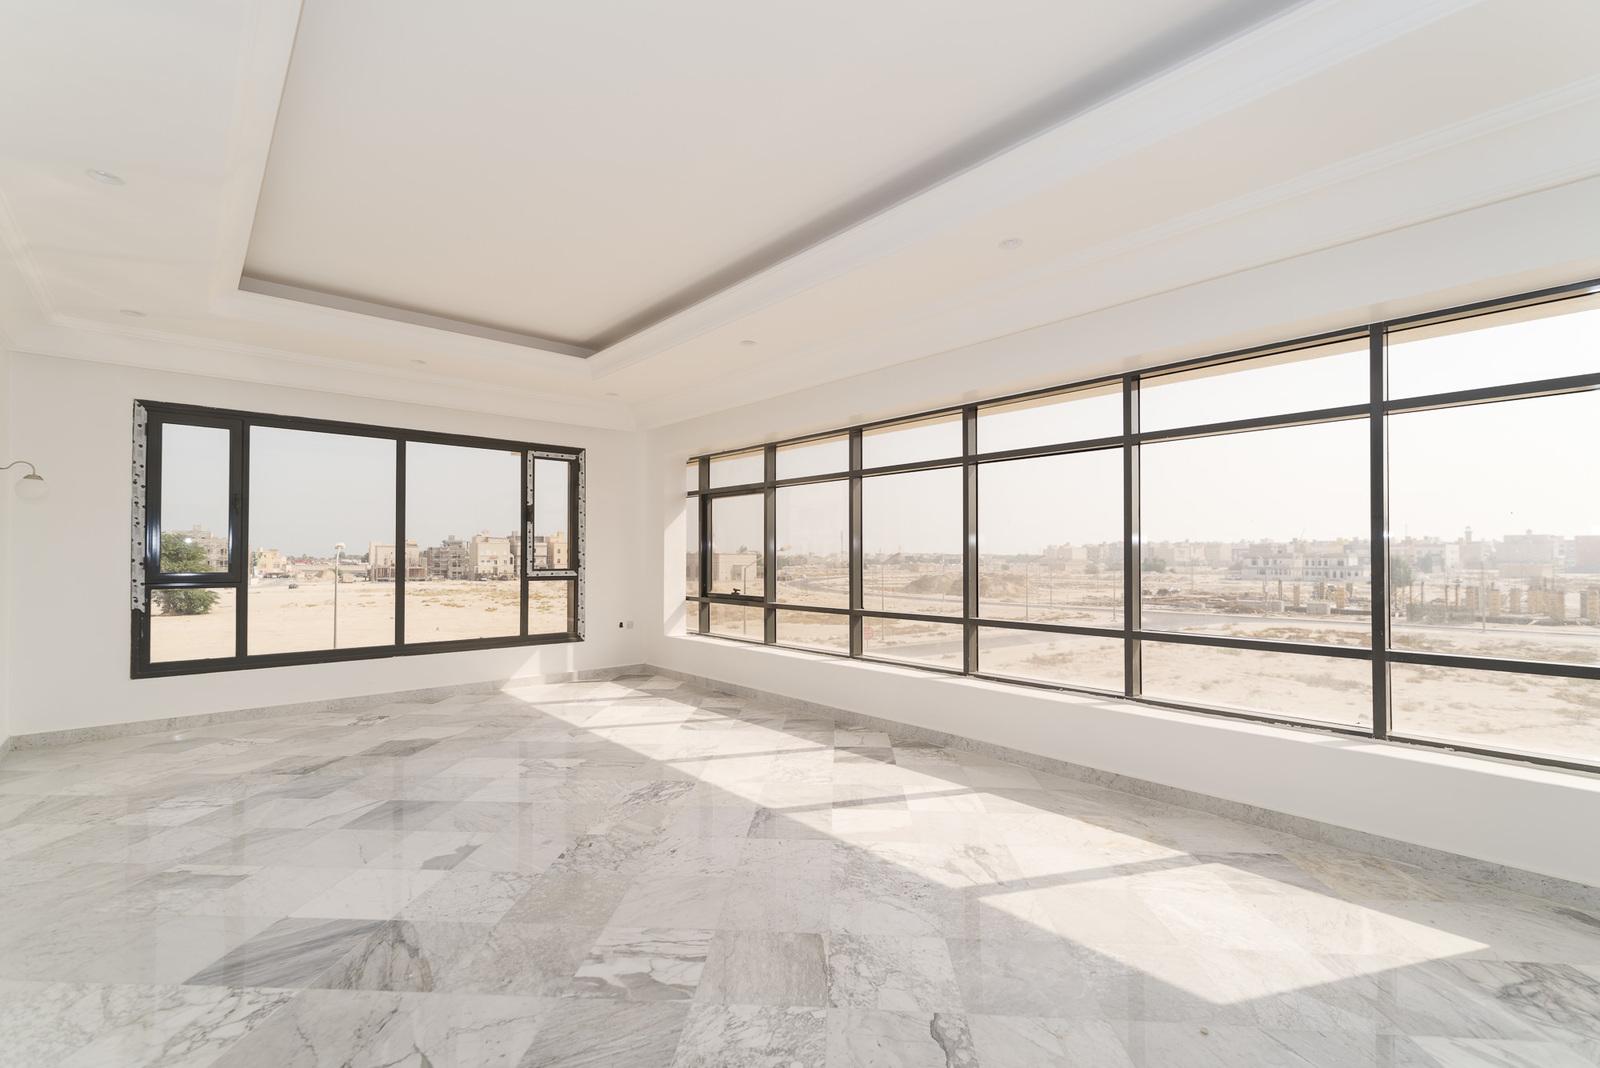 Abu Fatira – sunny, new, unfurnished, three bedroom apartments